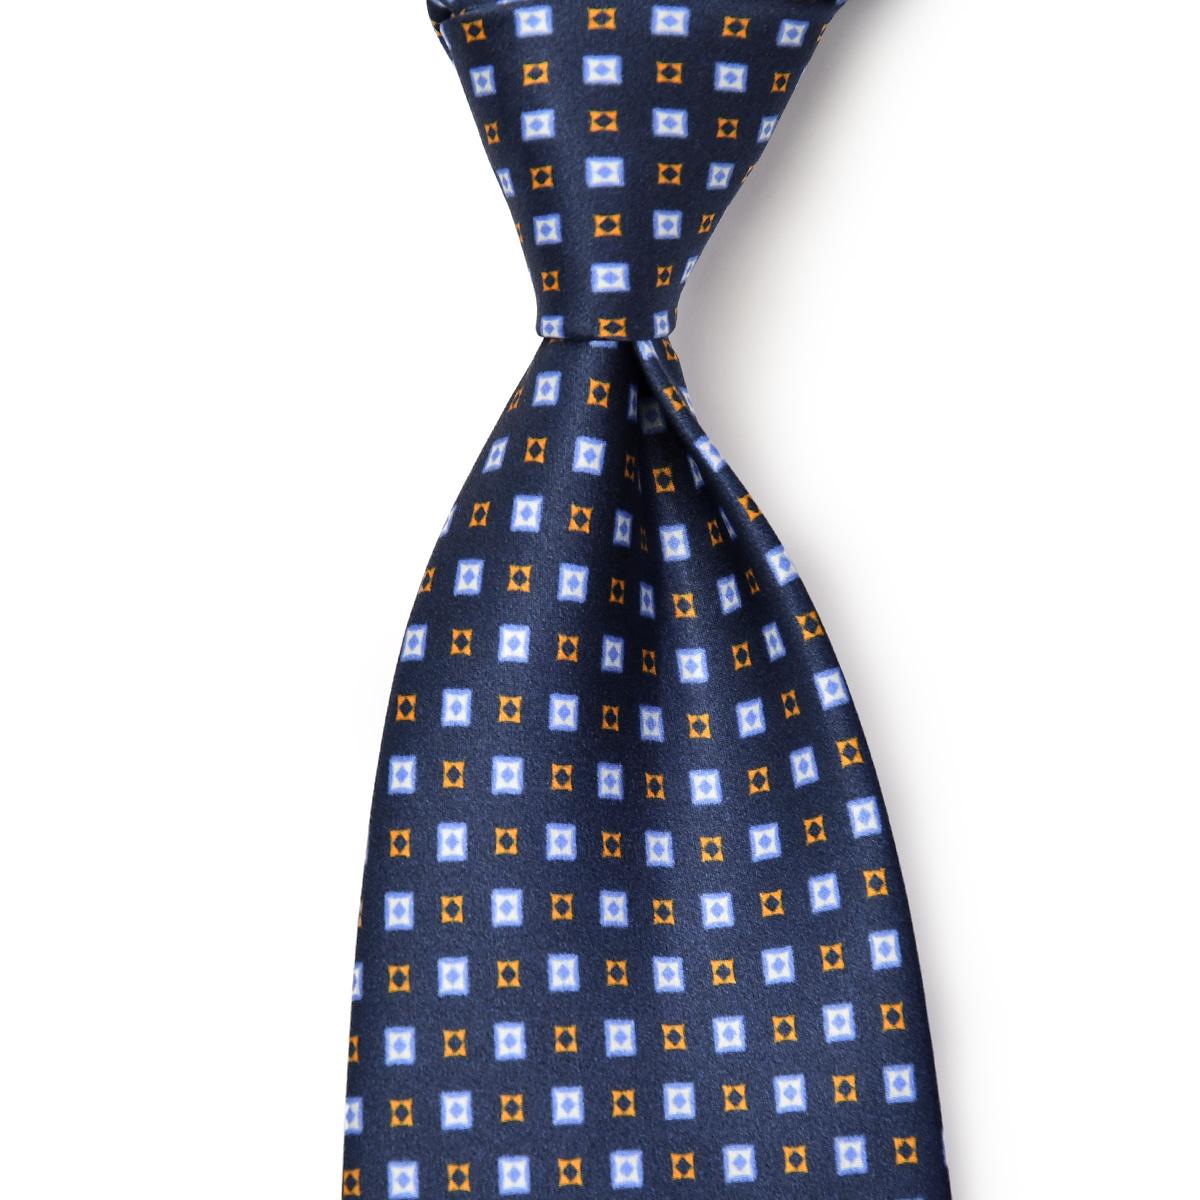 DOLCEPUNTA【ドルチェプンタ】シルクタイ TIE-P2023 6 セッテピエゲ シルク 小紋 ネイビー ブルー